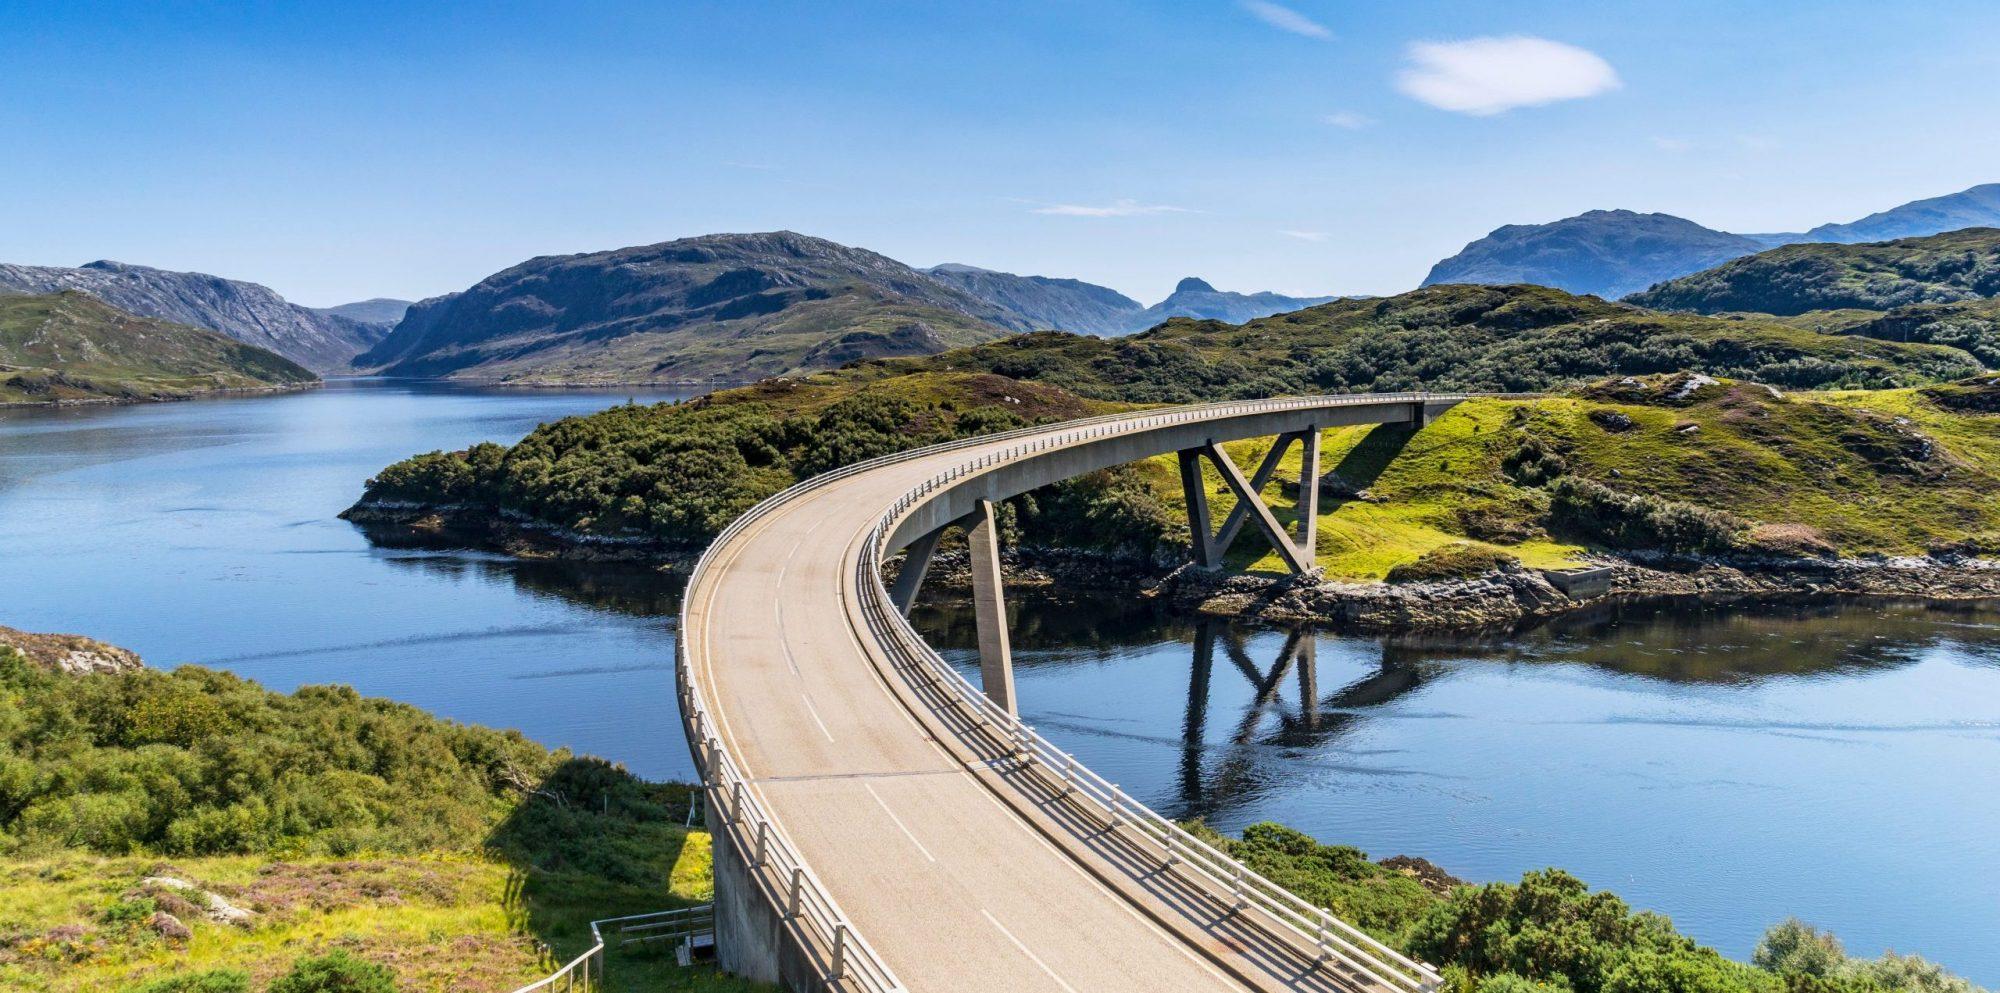 Kylesku Bridge Alamy Scaled Aspect Ratio X